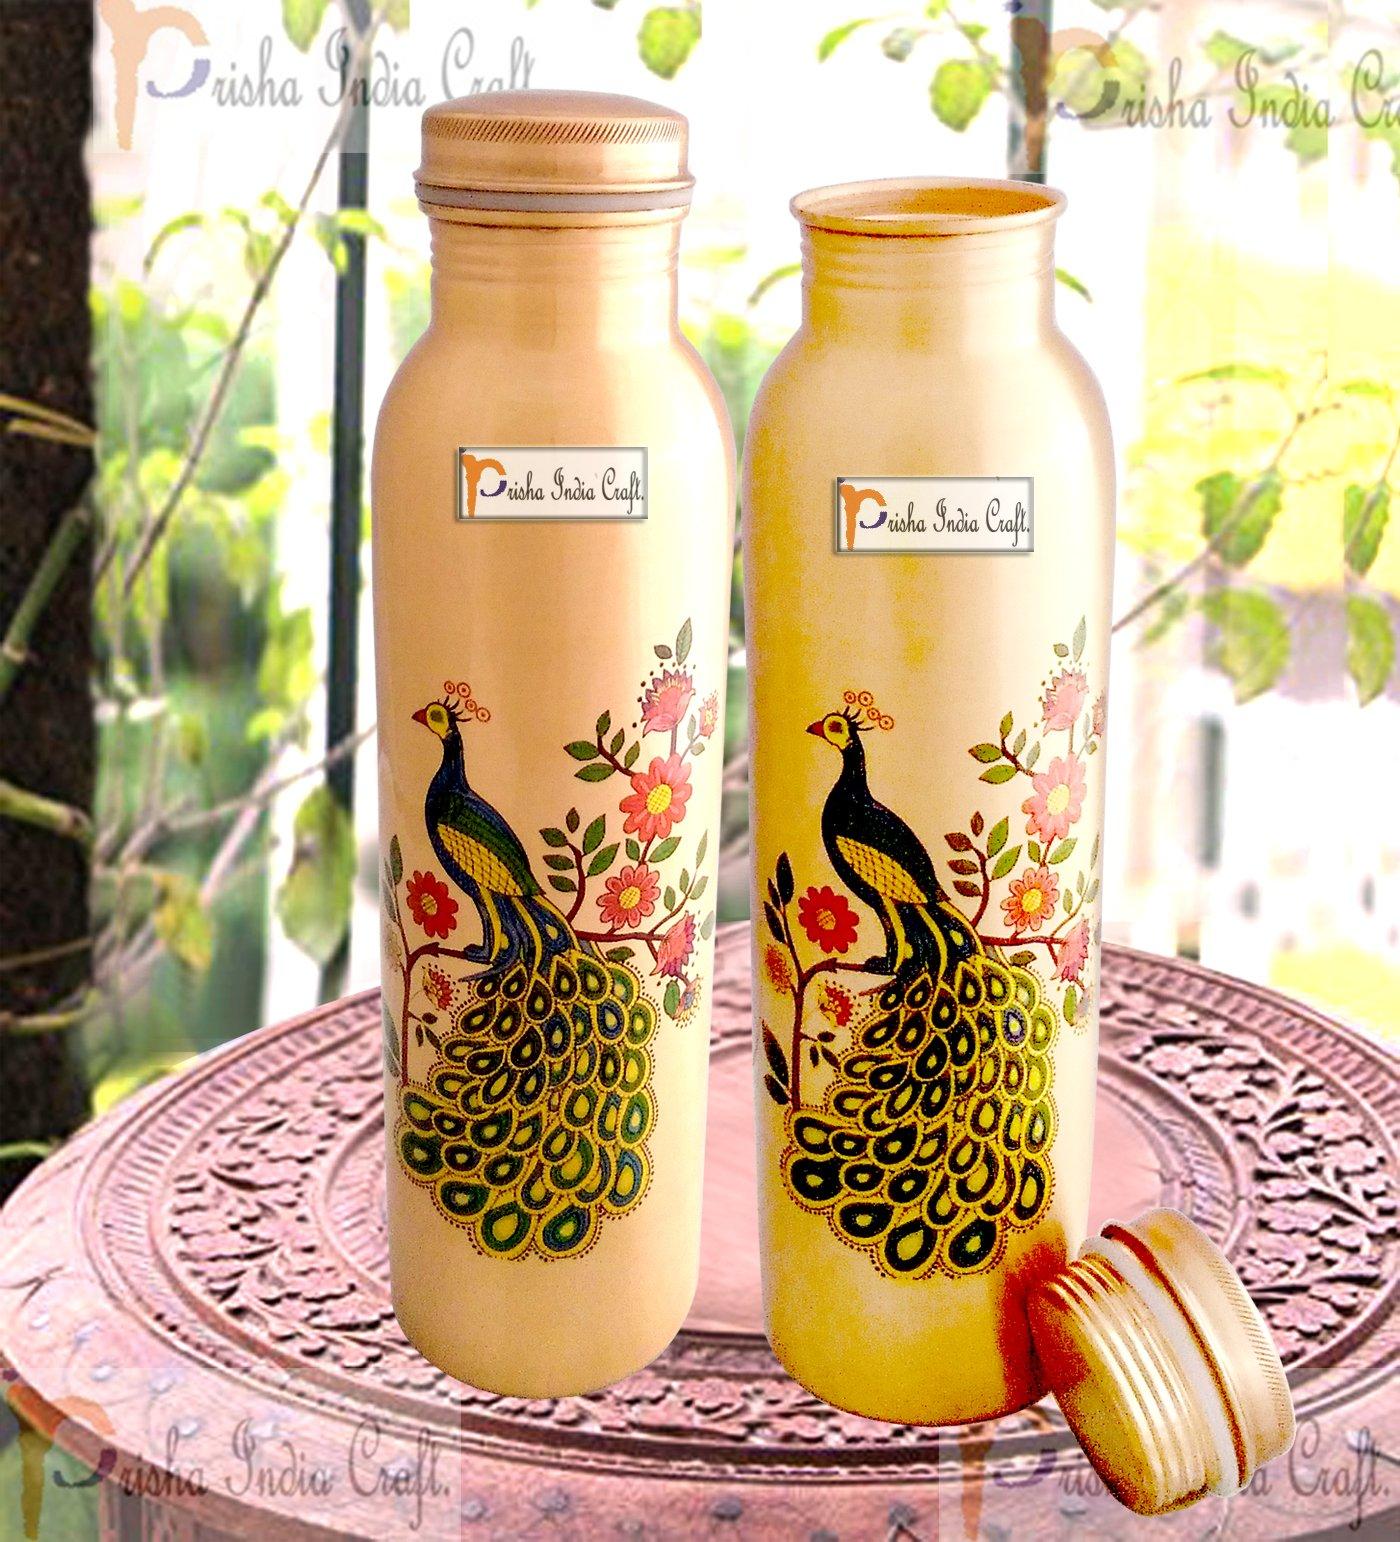 Prisha India Craft Digital Printed Pure Copper Water Bottle Kids School Water Bottles Outside Peacock Design | Capacity 1000 ML | Set of 2